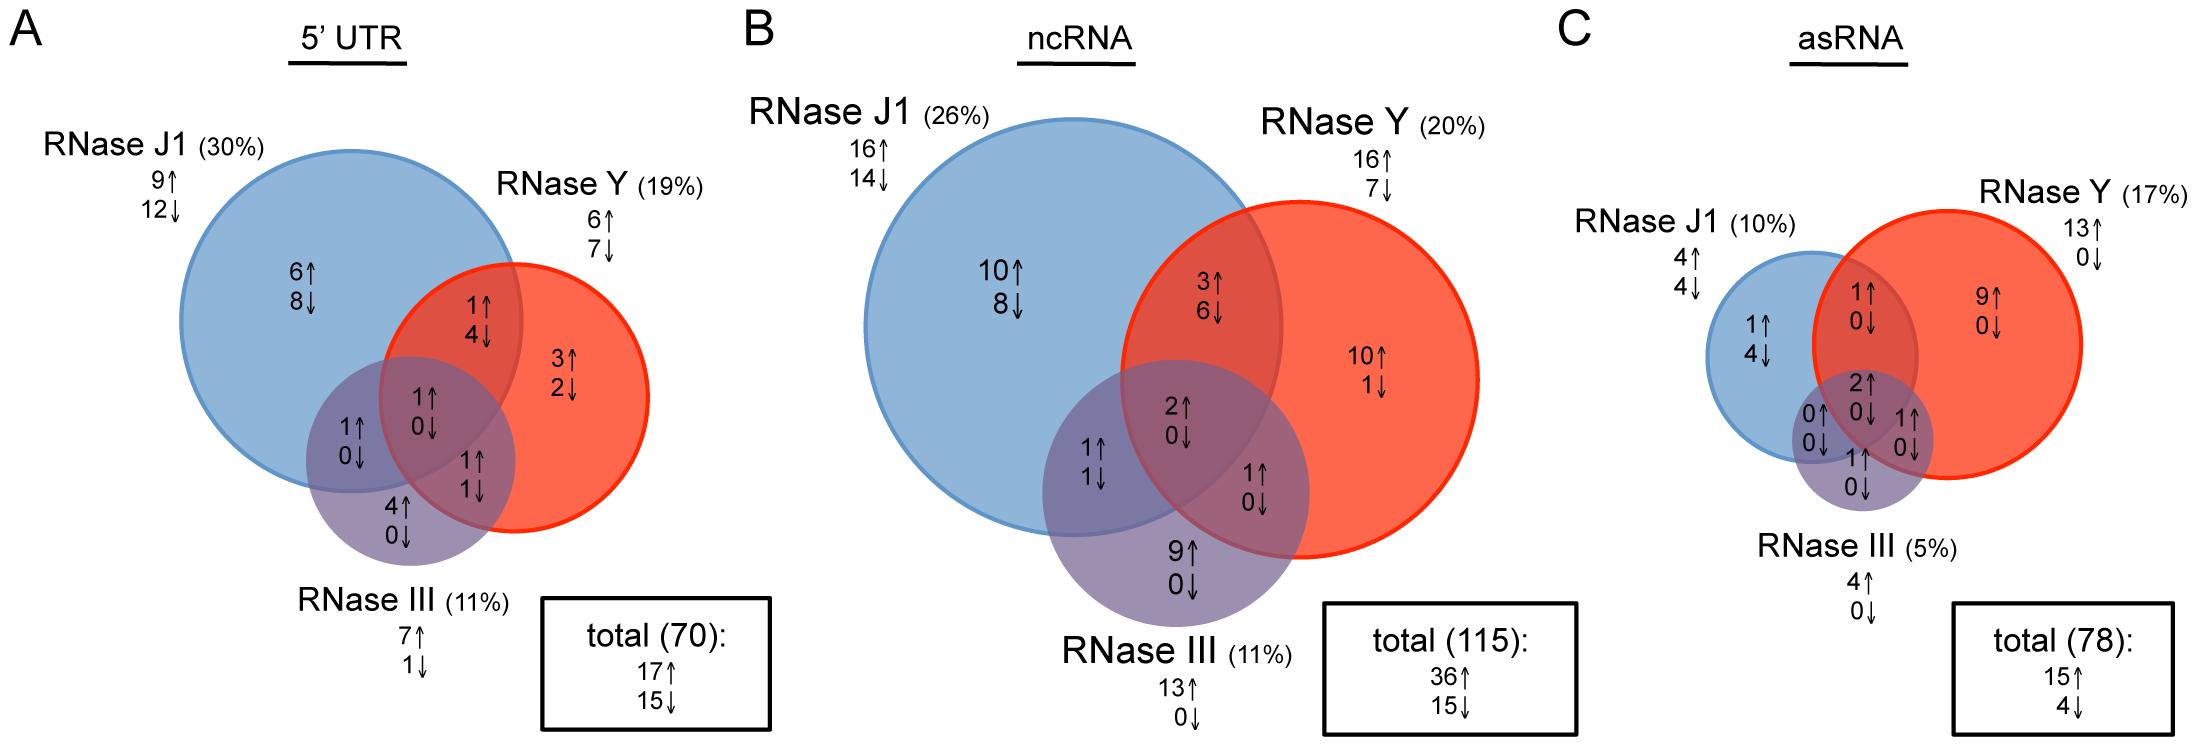 Effects of RNase J1, Y, and III depletion on abundance of <i>B. subtilis</i> regulatory RNAs.